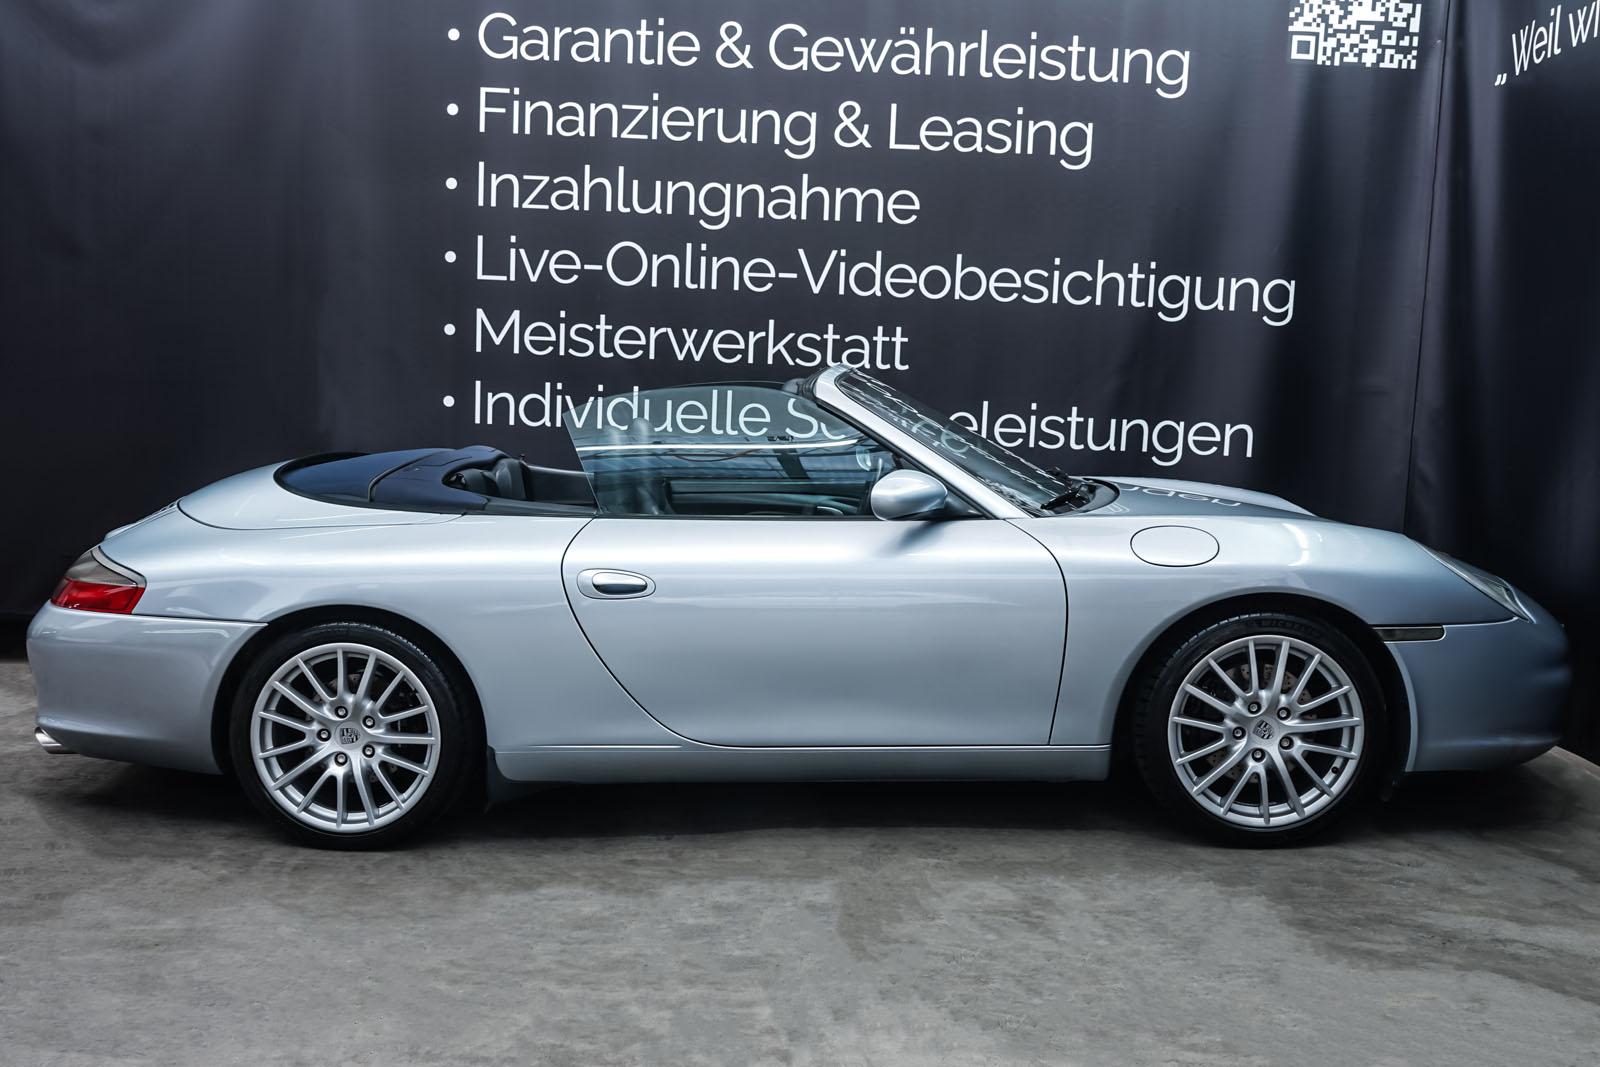 Porsche_996_Cabrio_Silber_Dunkelblau_POR-1724_18_w